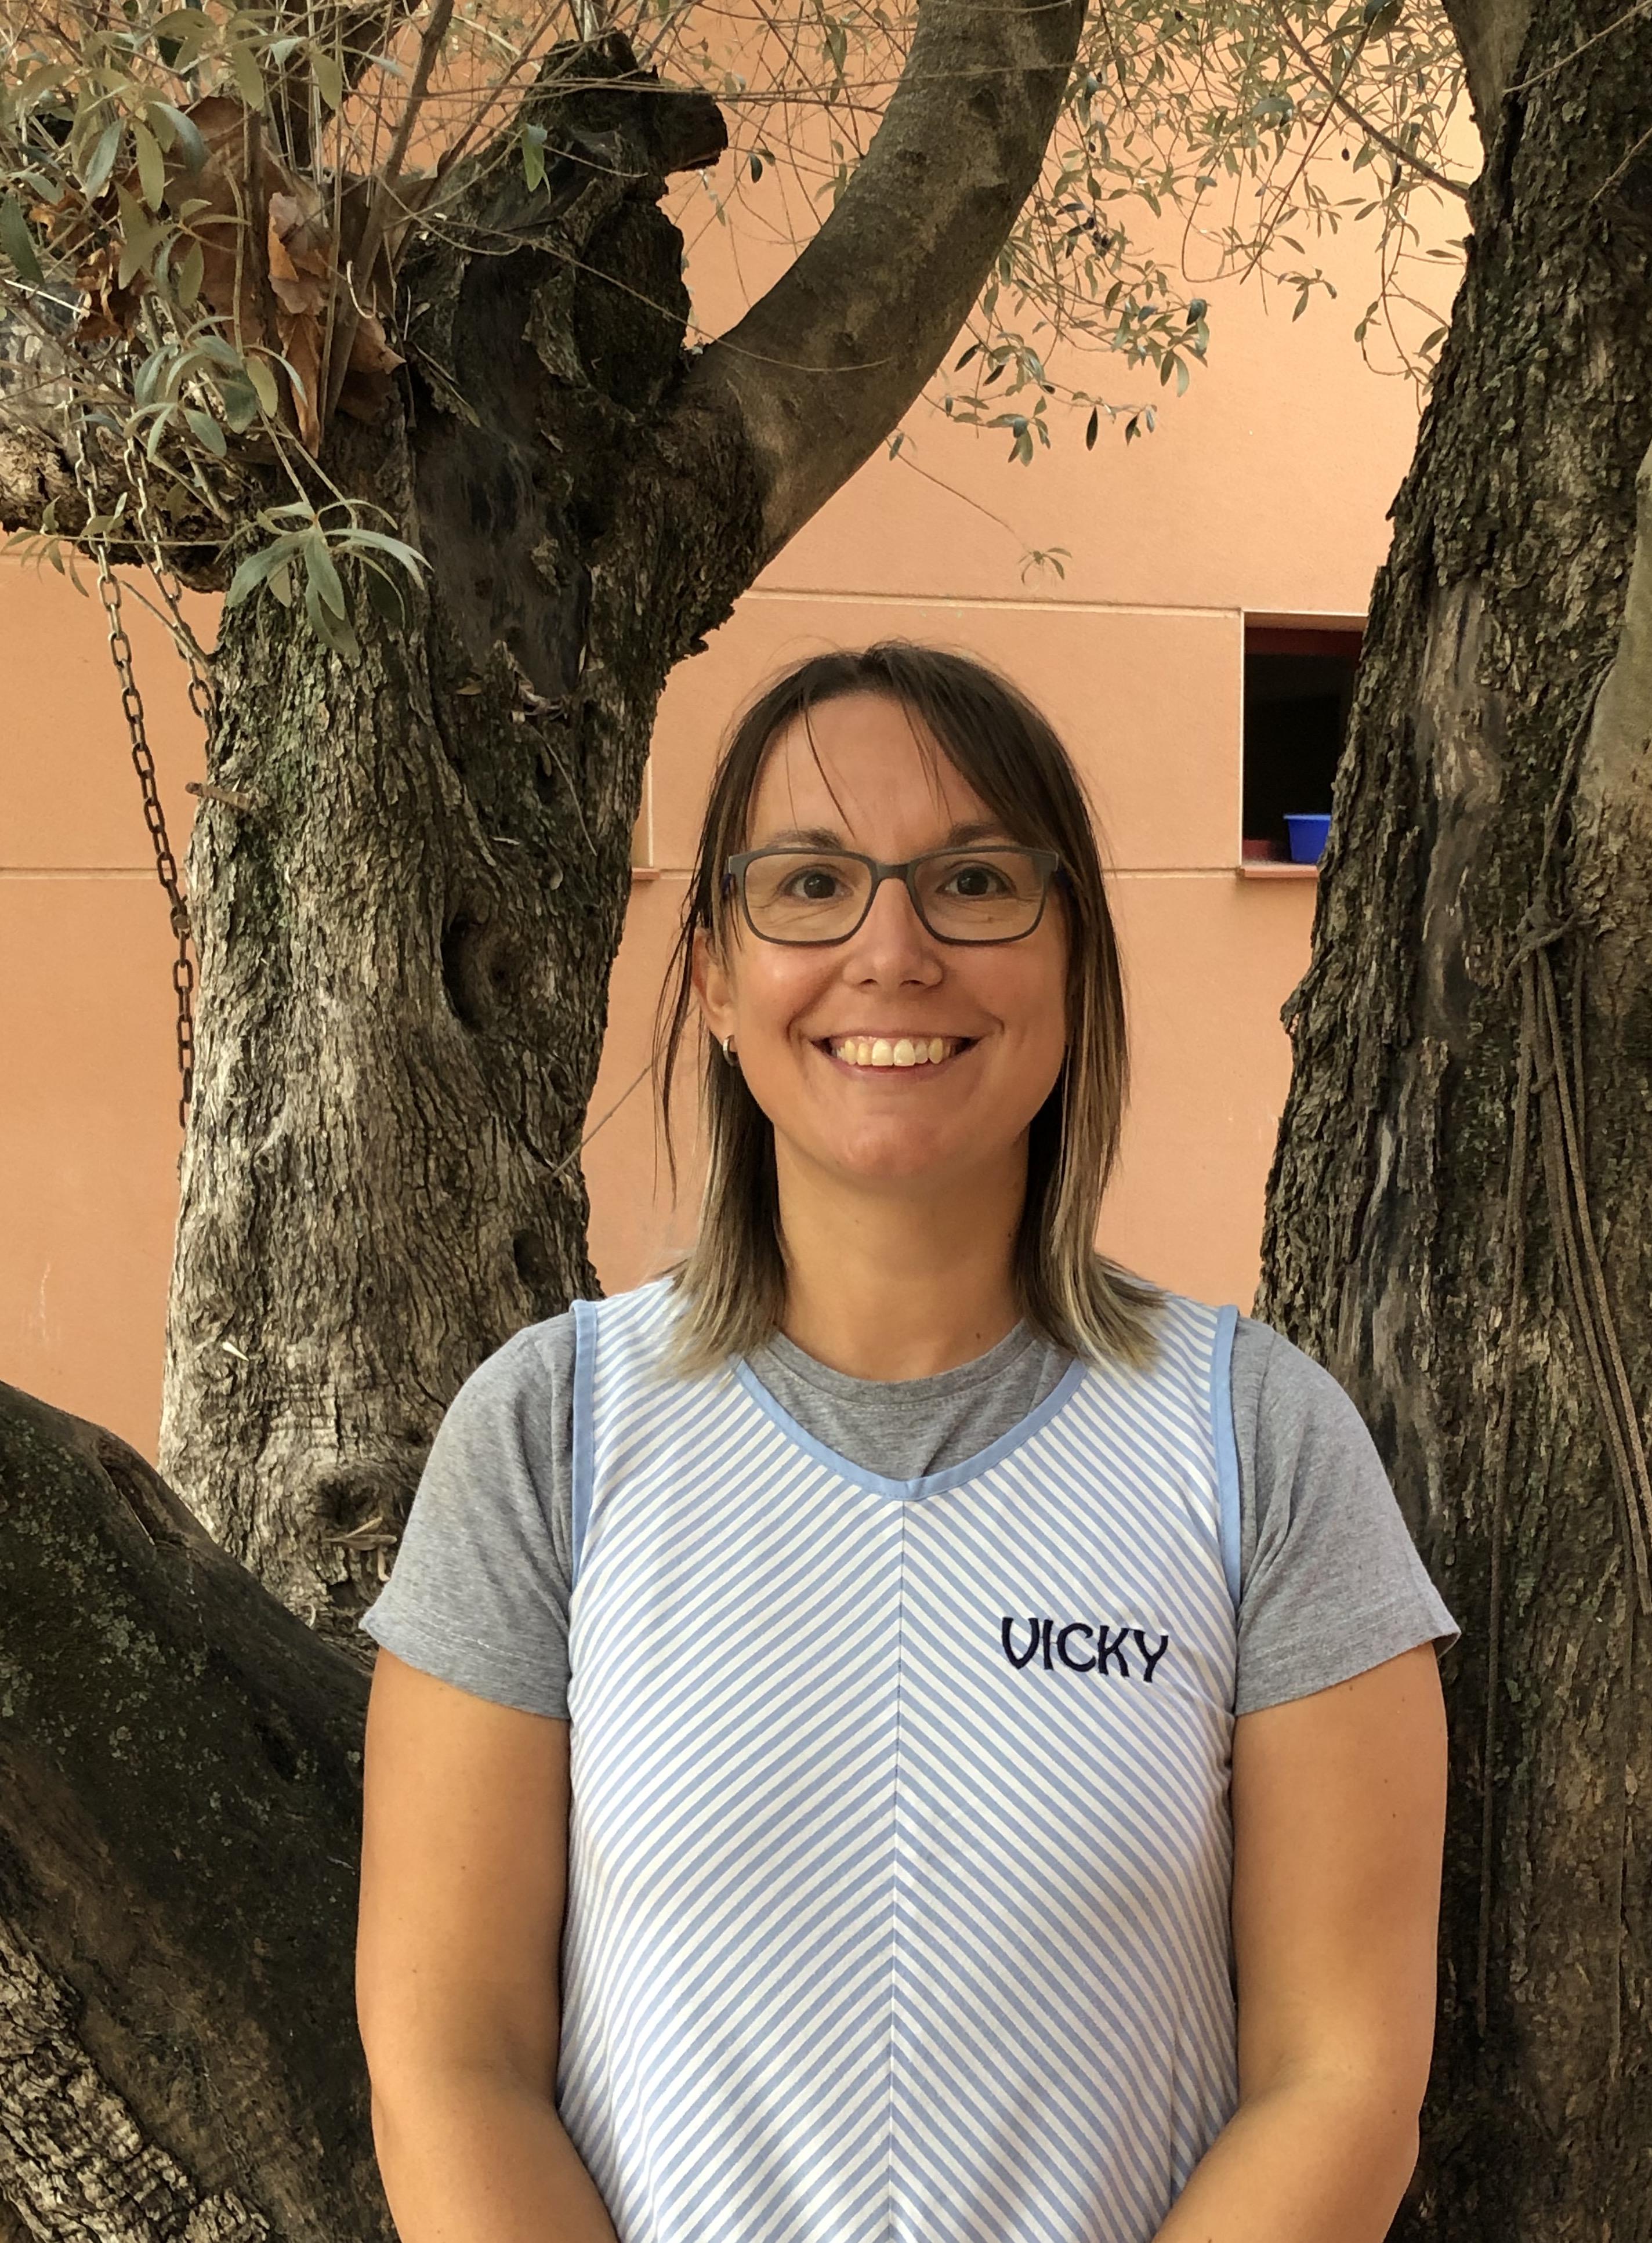 Vicky Preto